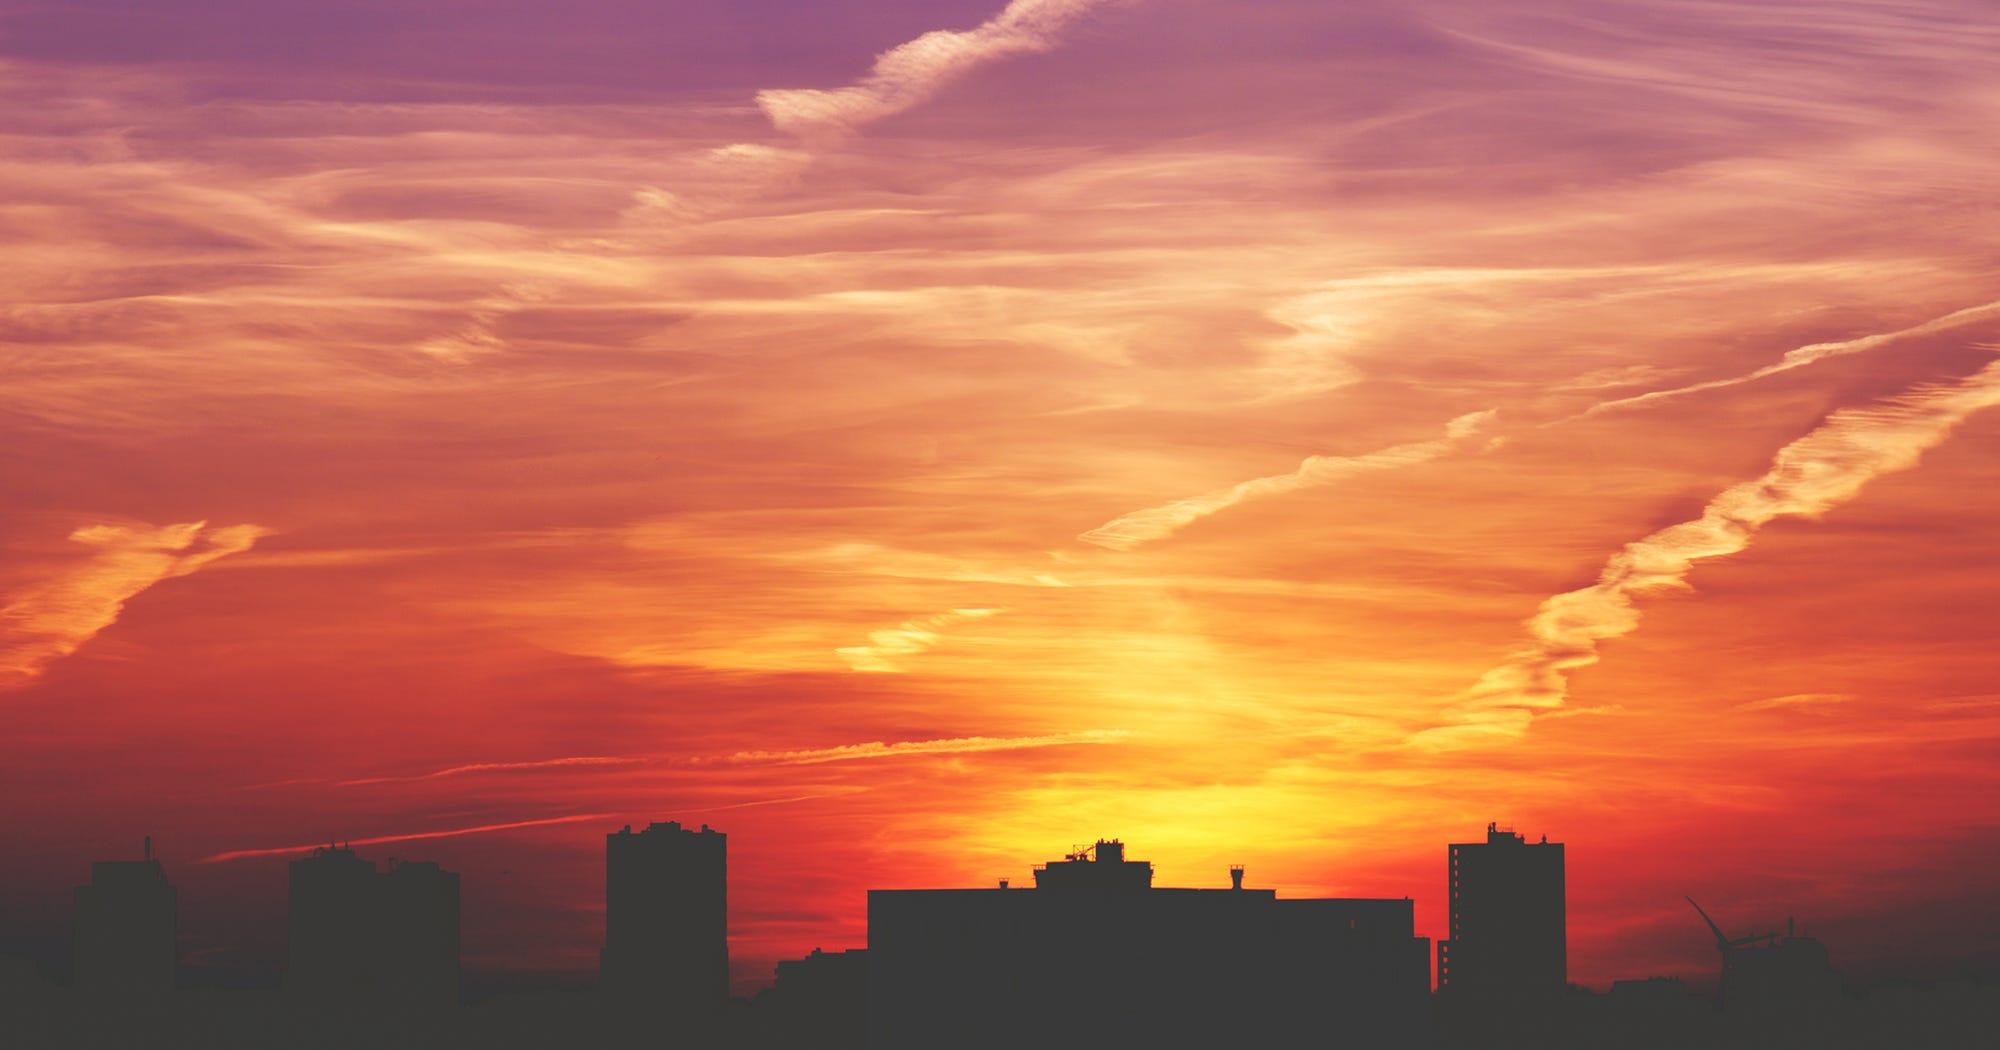 Sunset Eyes Makeup Trend Pink Orange Warm Tones Photos